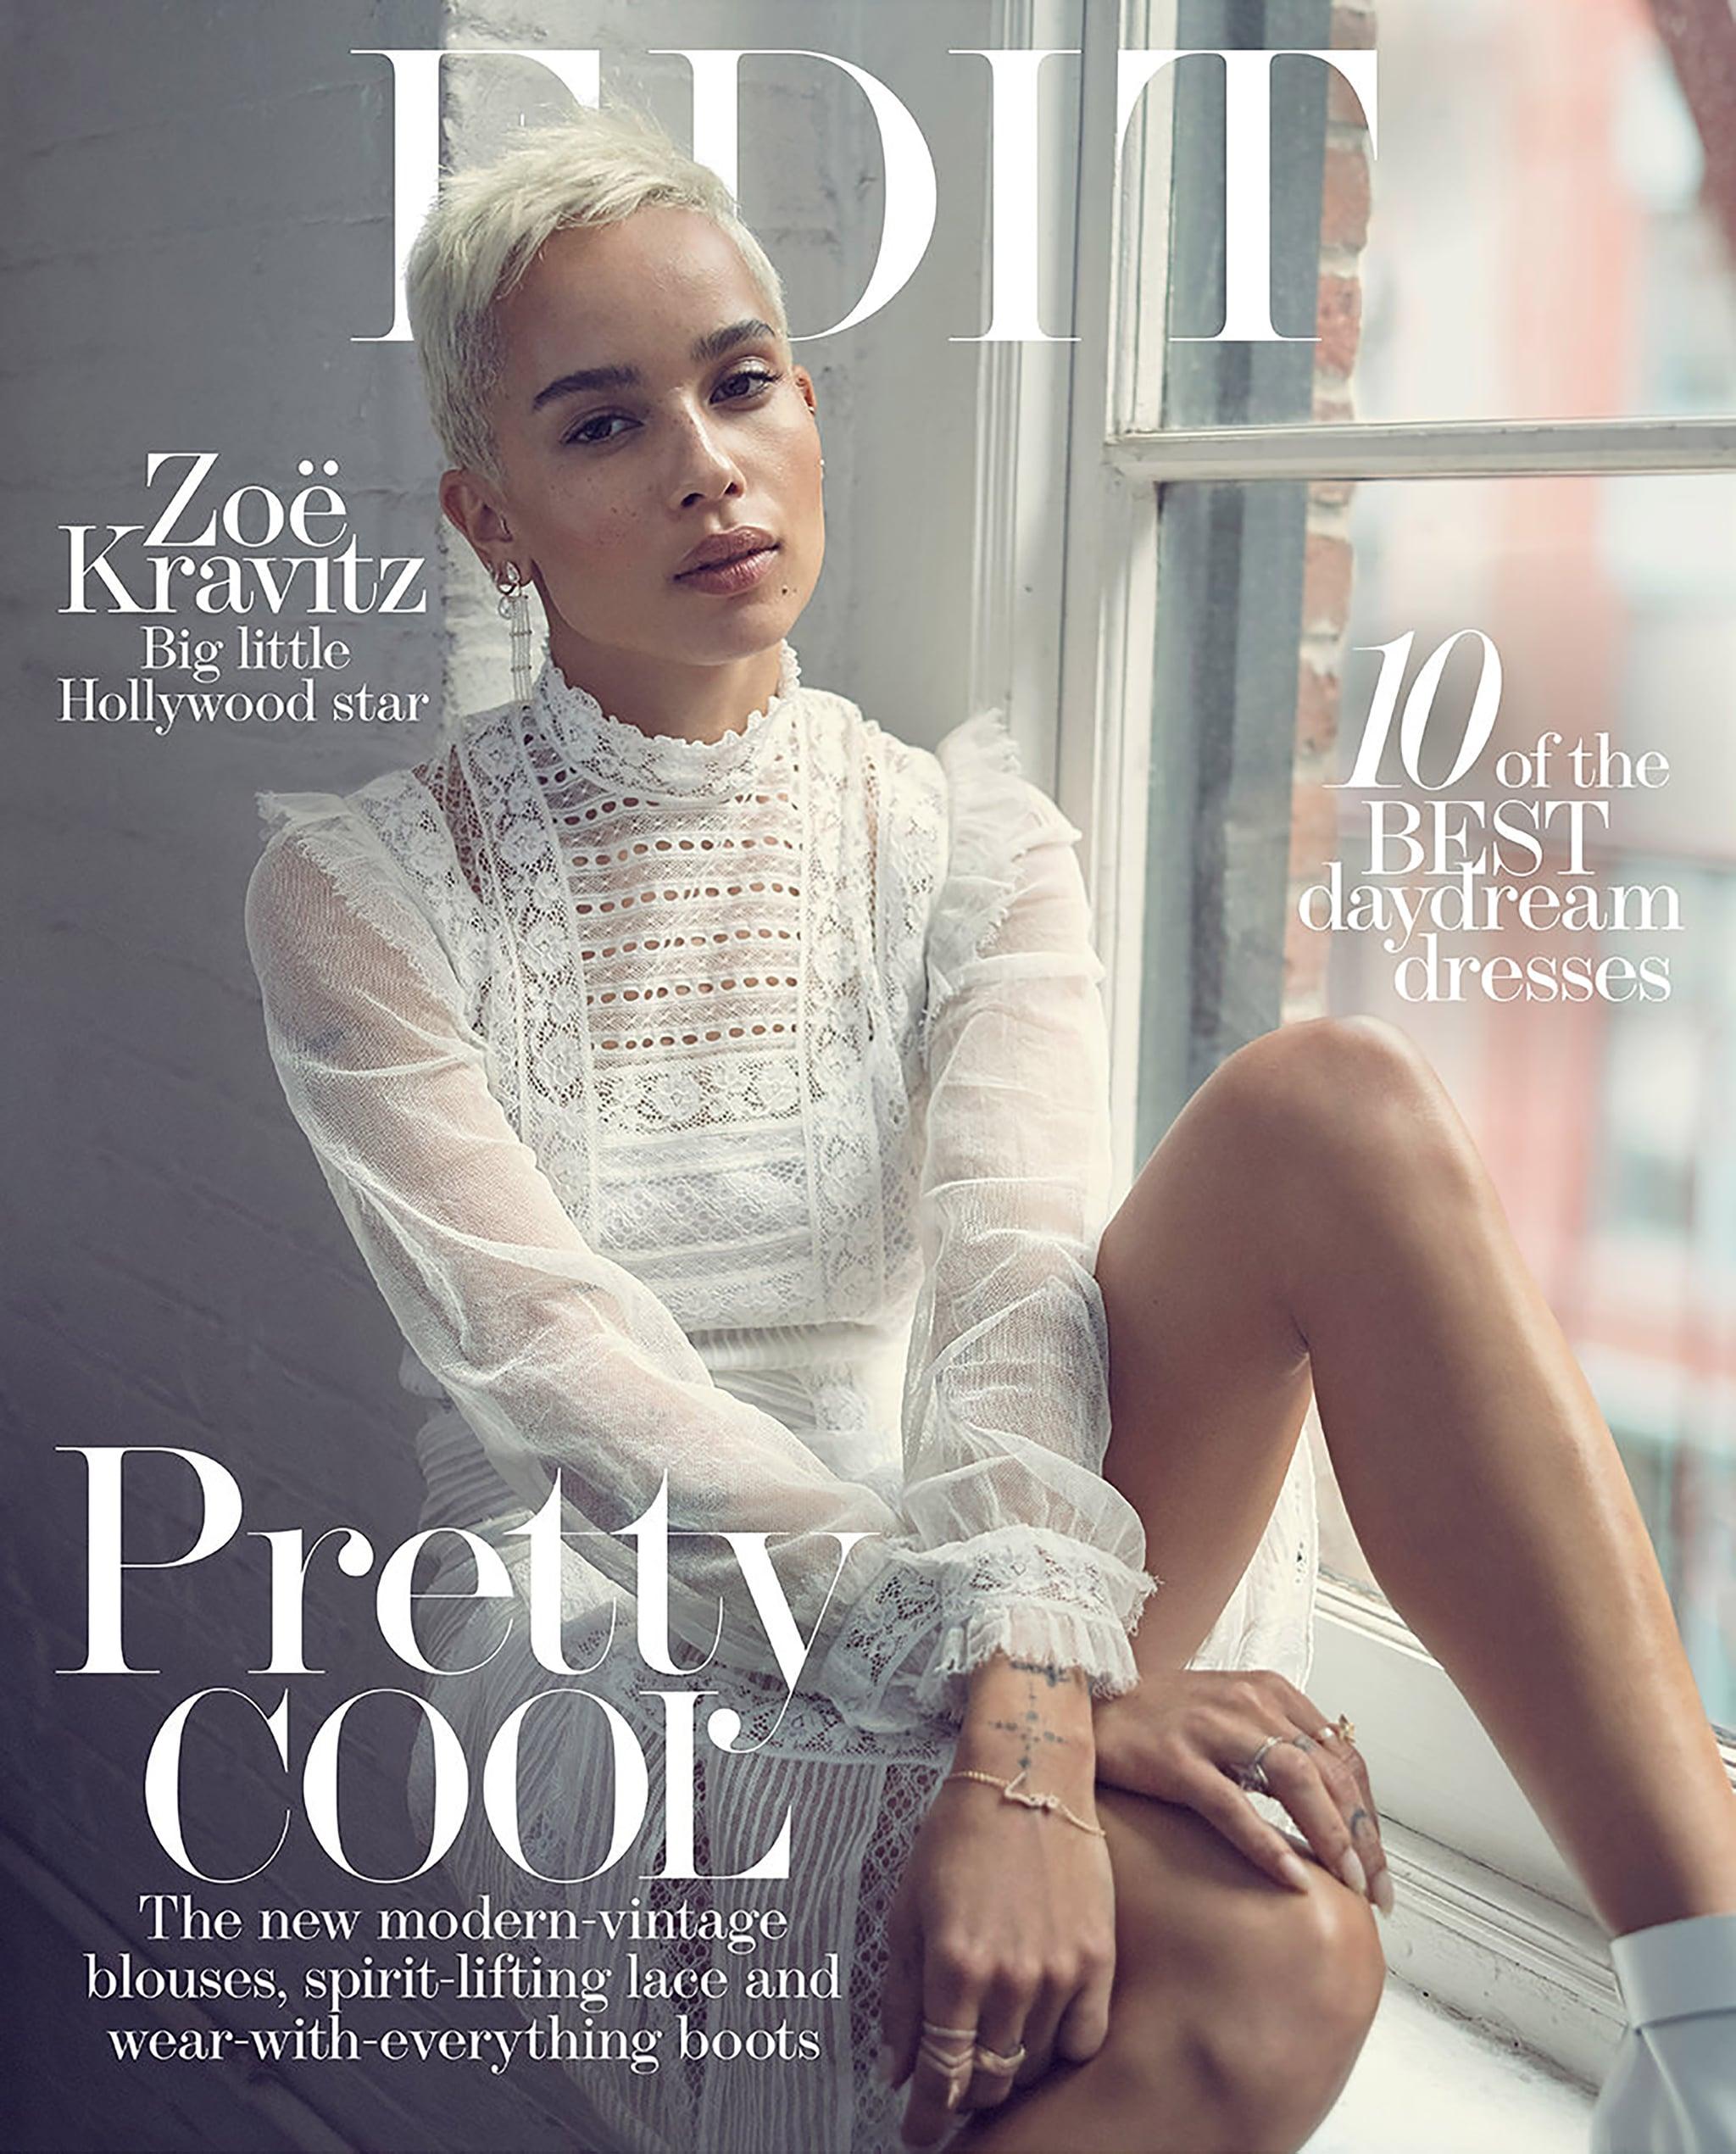 Zoe Kravitz Uk: Zoe Kravitz Quotes About Nicole Kidman And Parents June